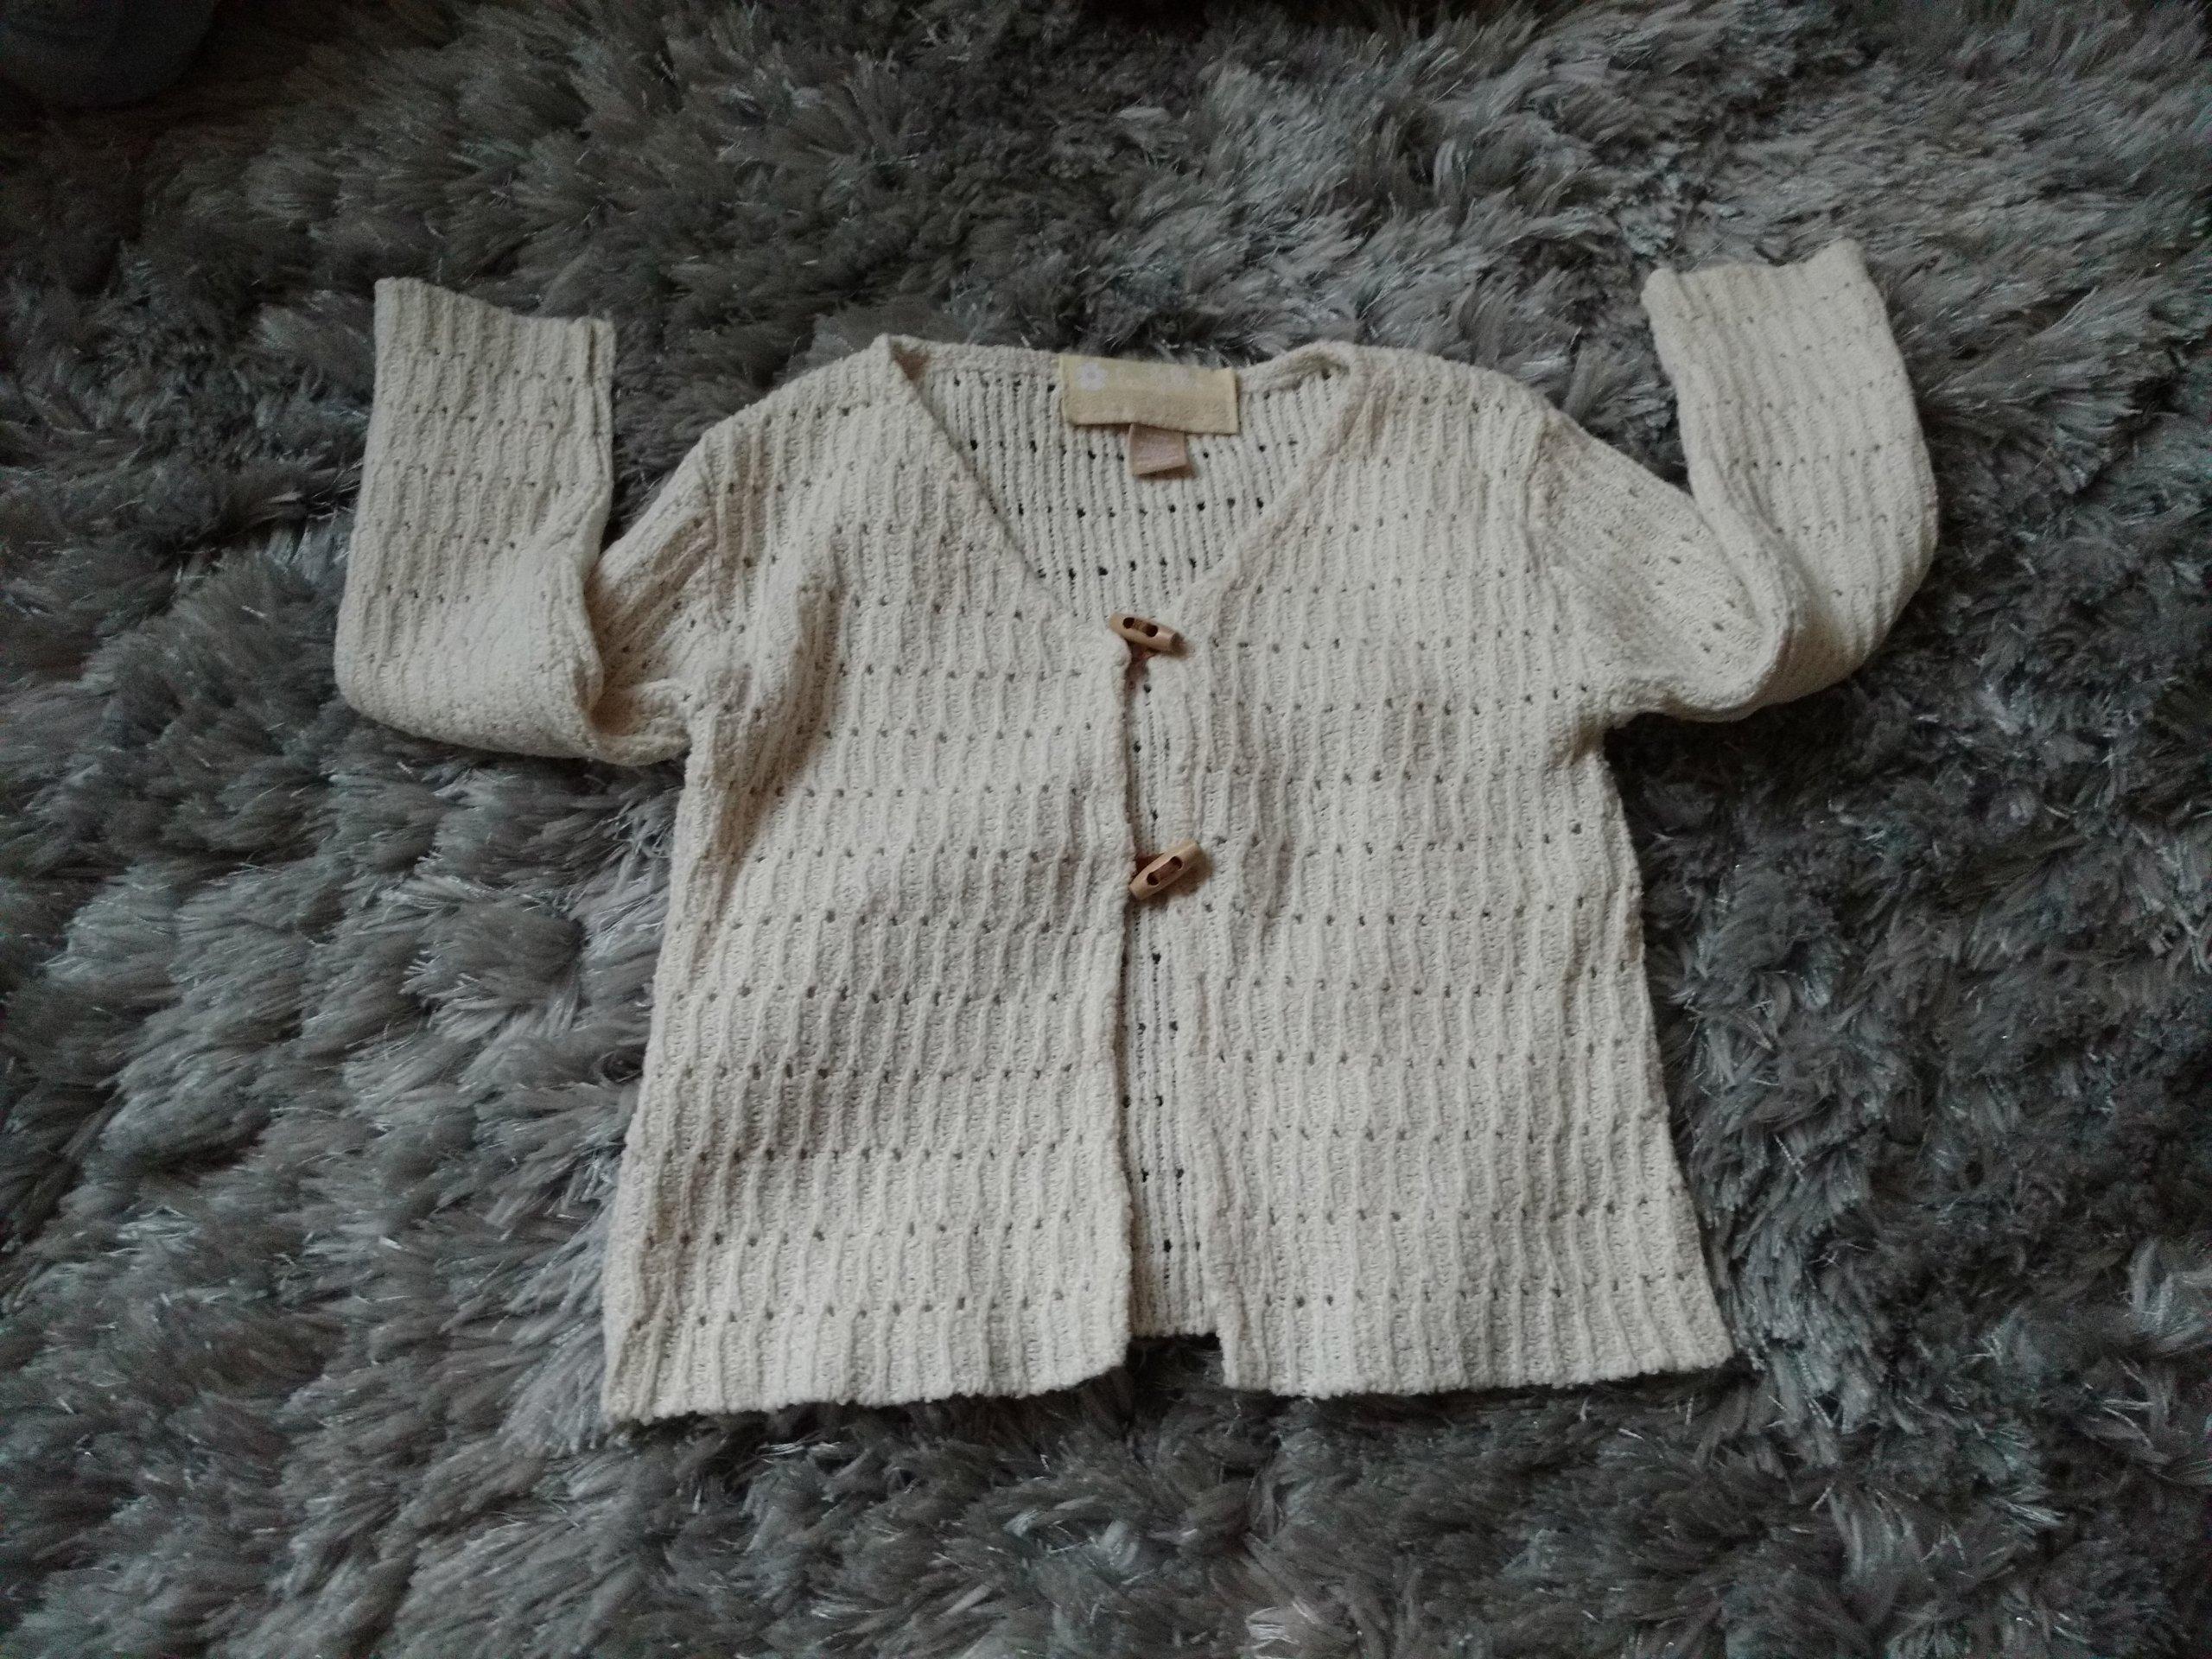 ORCHESTRA j.beż sweterek rozpinany 92-98 bdb